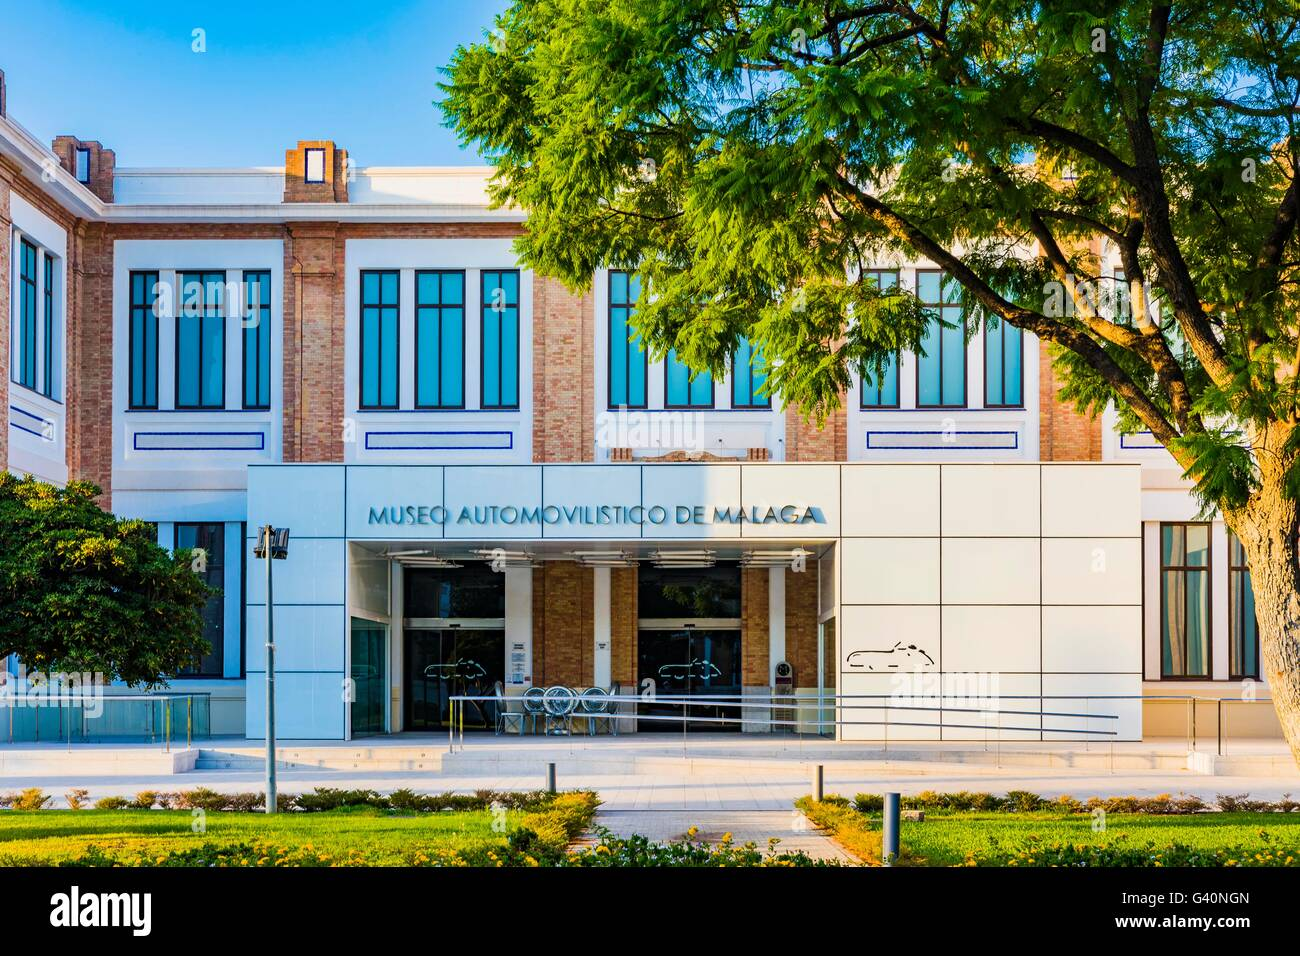 Facade, Malaga Car Museum. Tabacalera Complex. Málaga, Costa del Sol, Andalucía, Spain, Europe - Stock Image